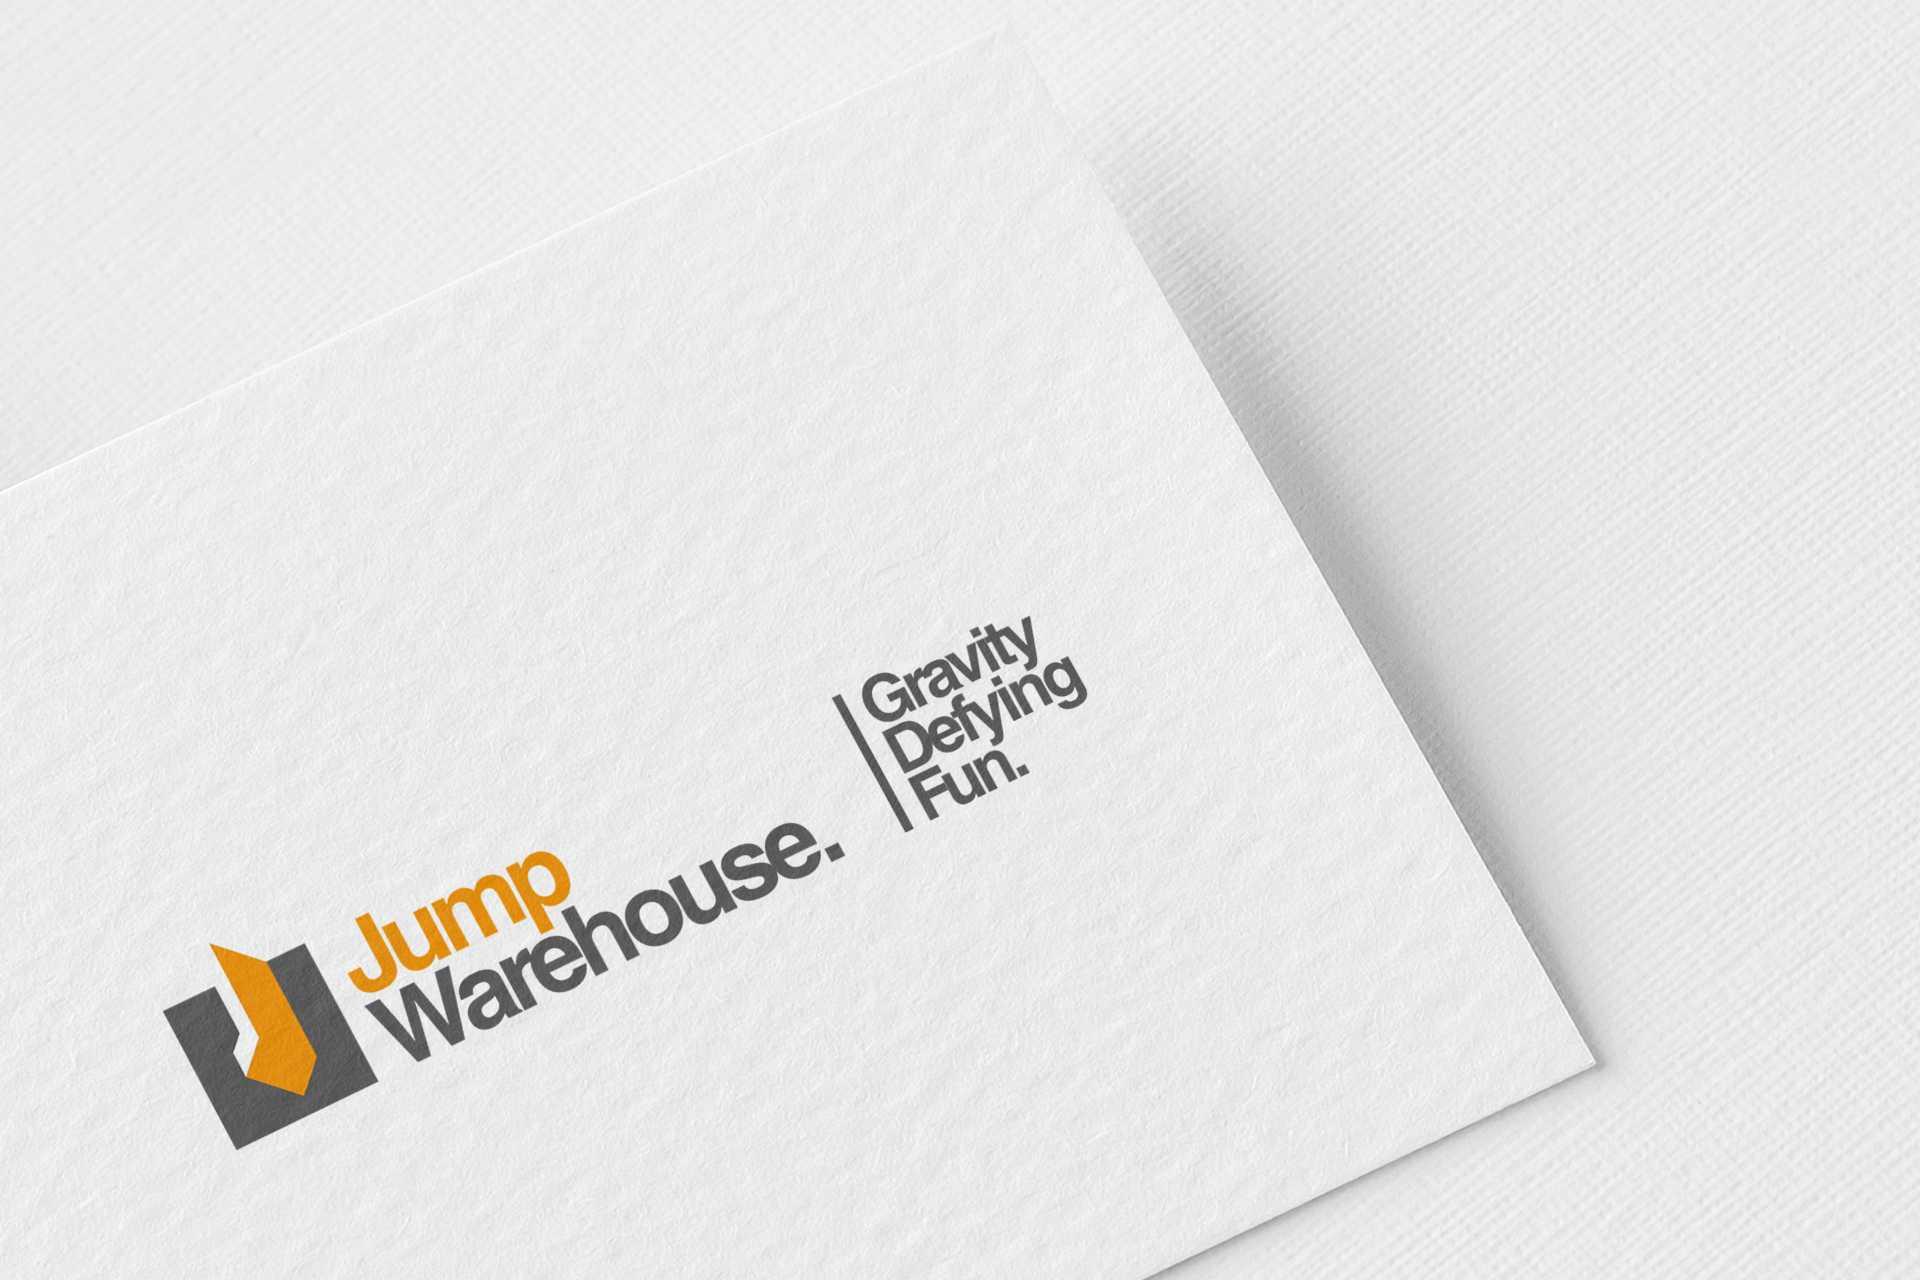 pixel-perfect-warrington-jump-warehouse-logo-design